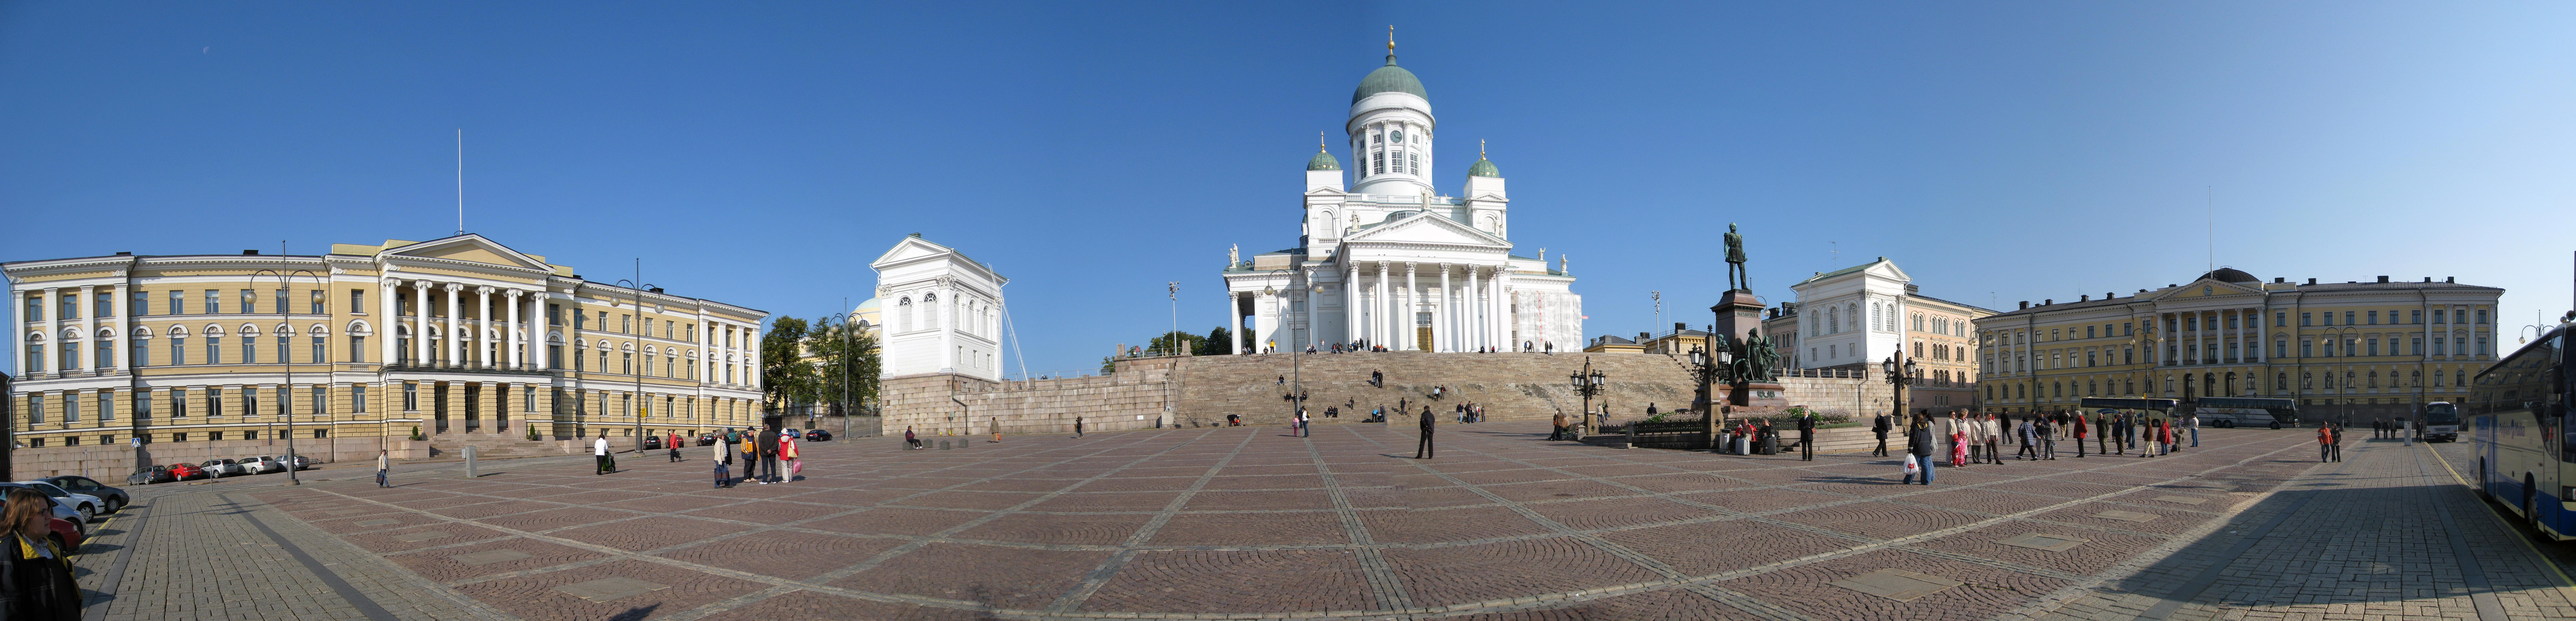 Senate Square - Senaatintori - Senatstorget, Helsinki, Finland.jpg